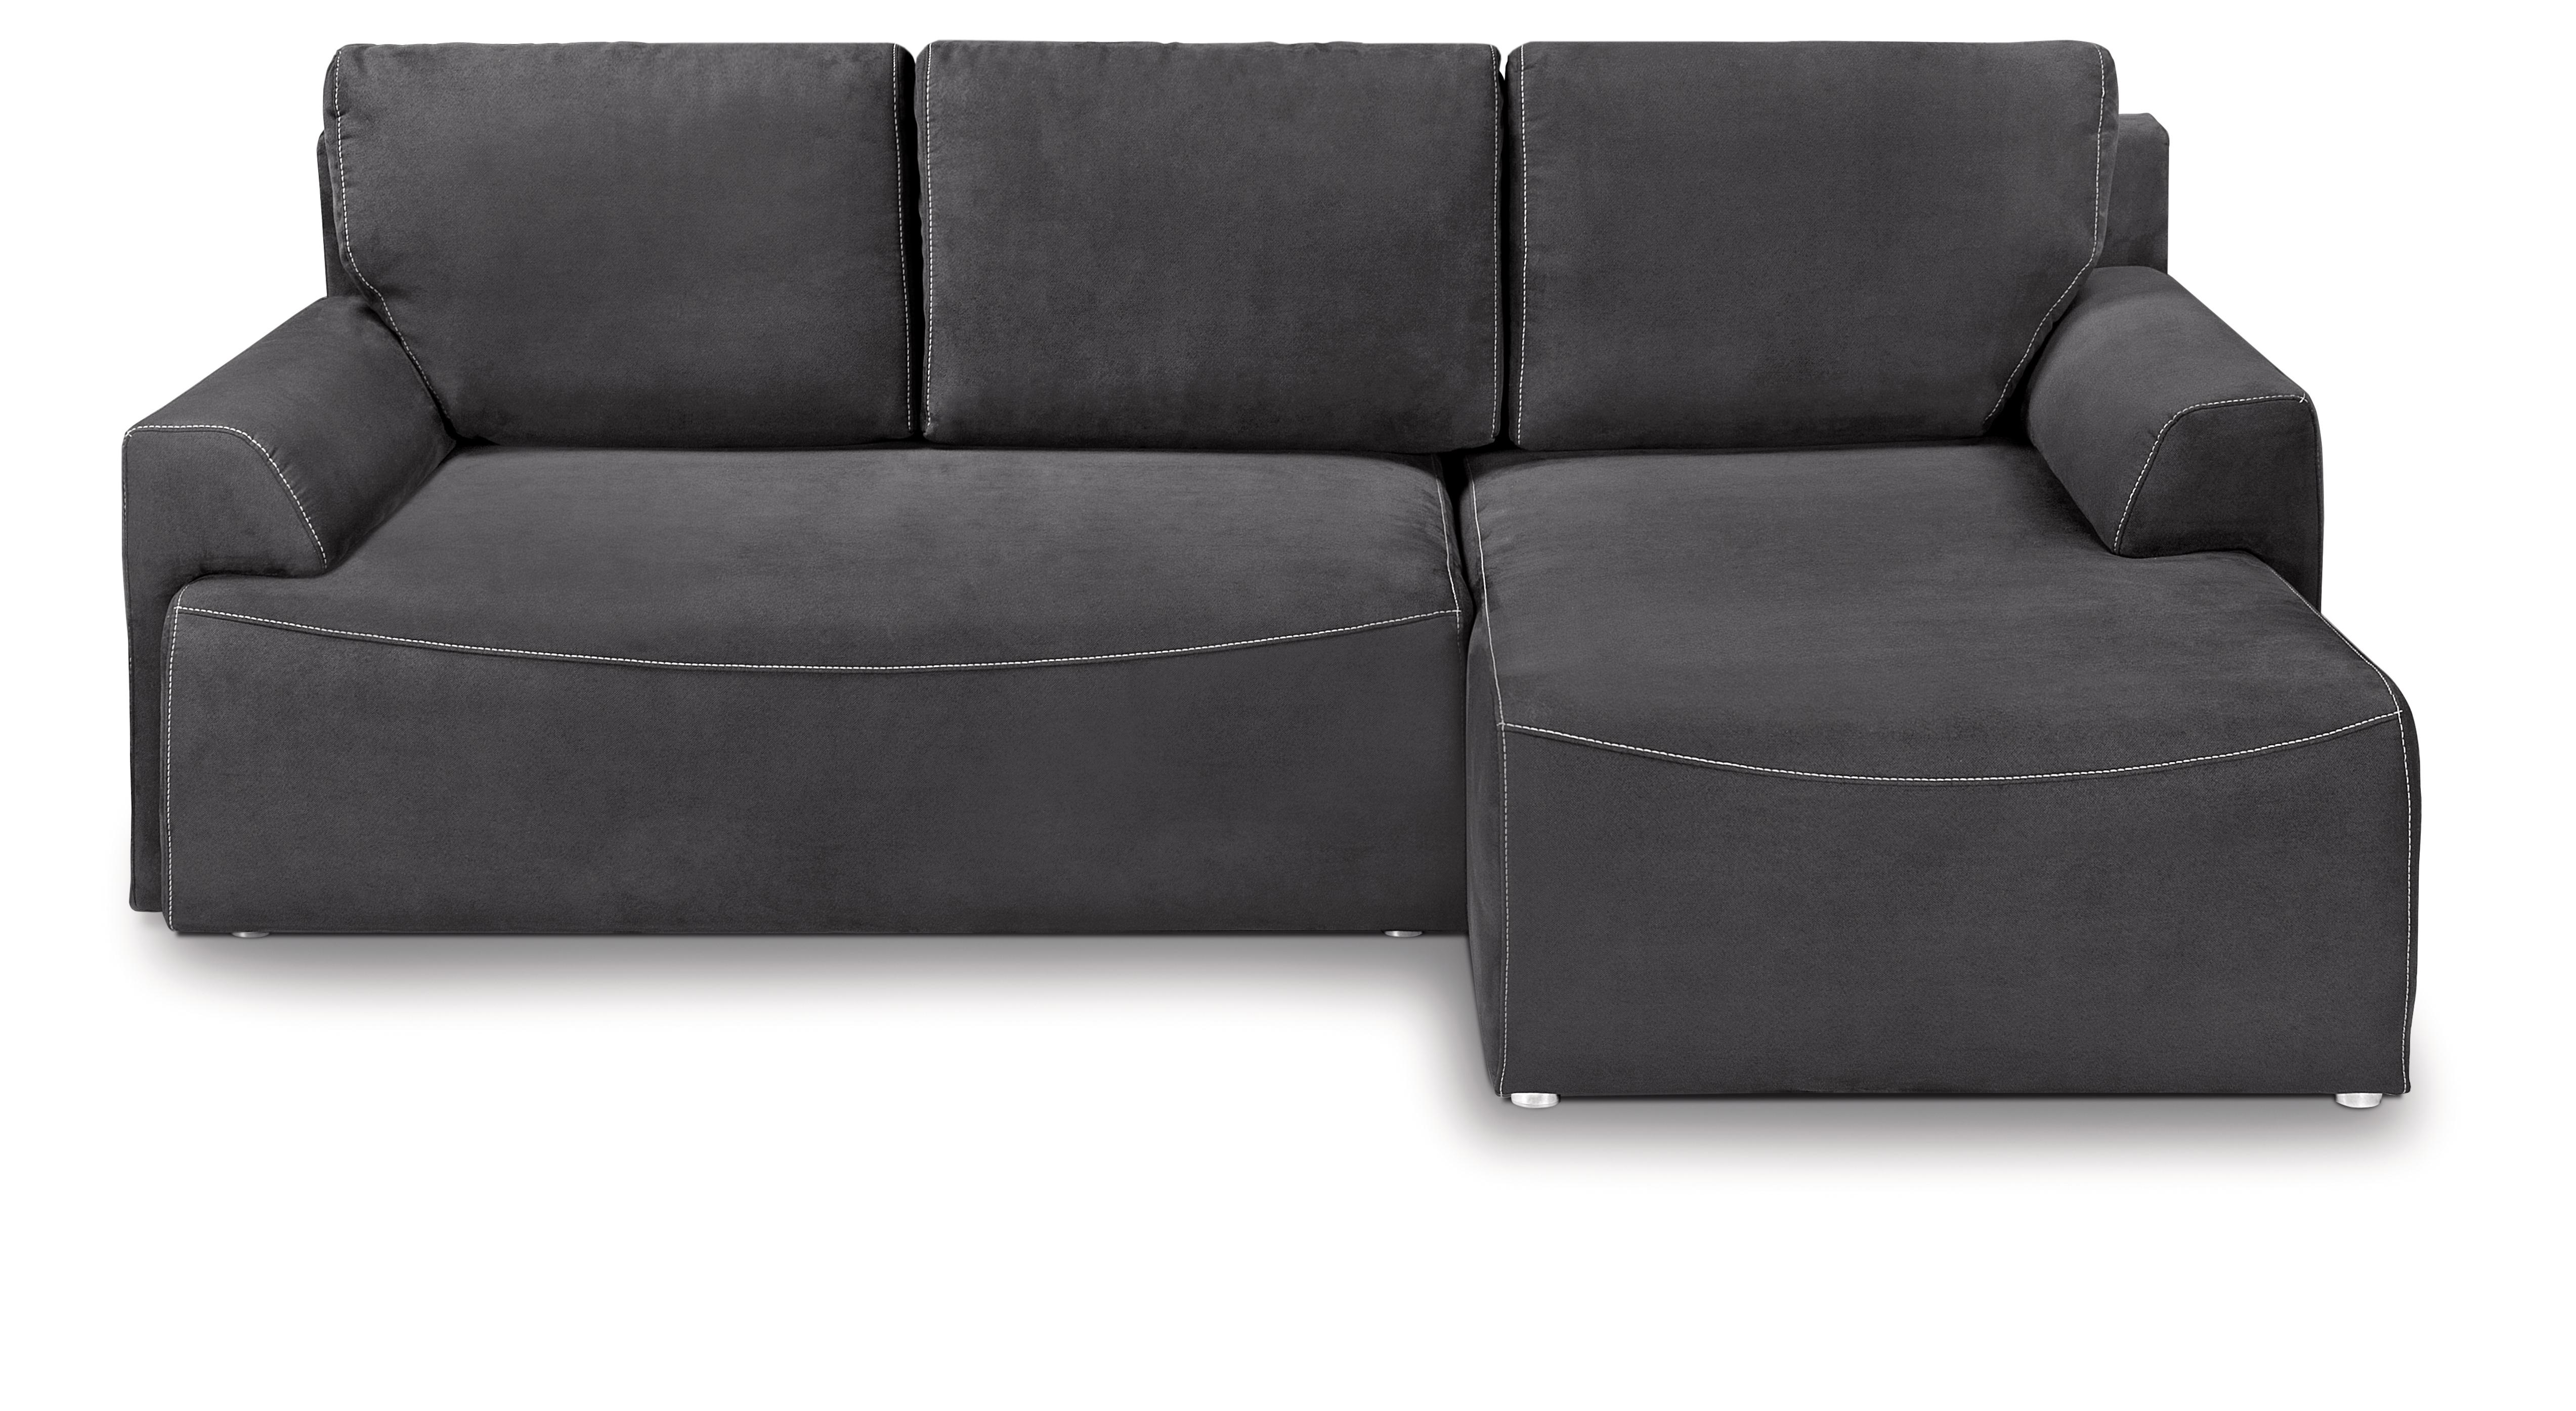 Rohová sedací souprava - BRW - City Lux 3DL URC (šedá) (P)